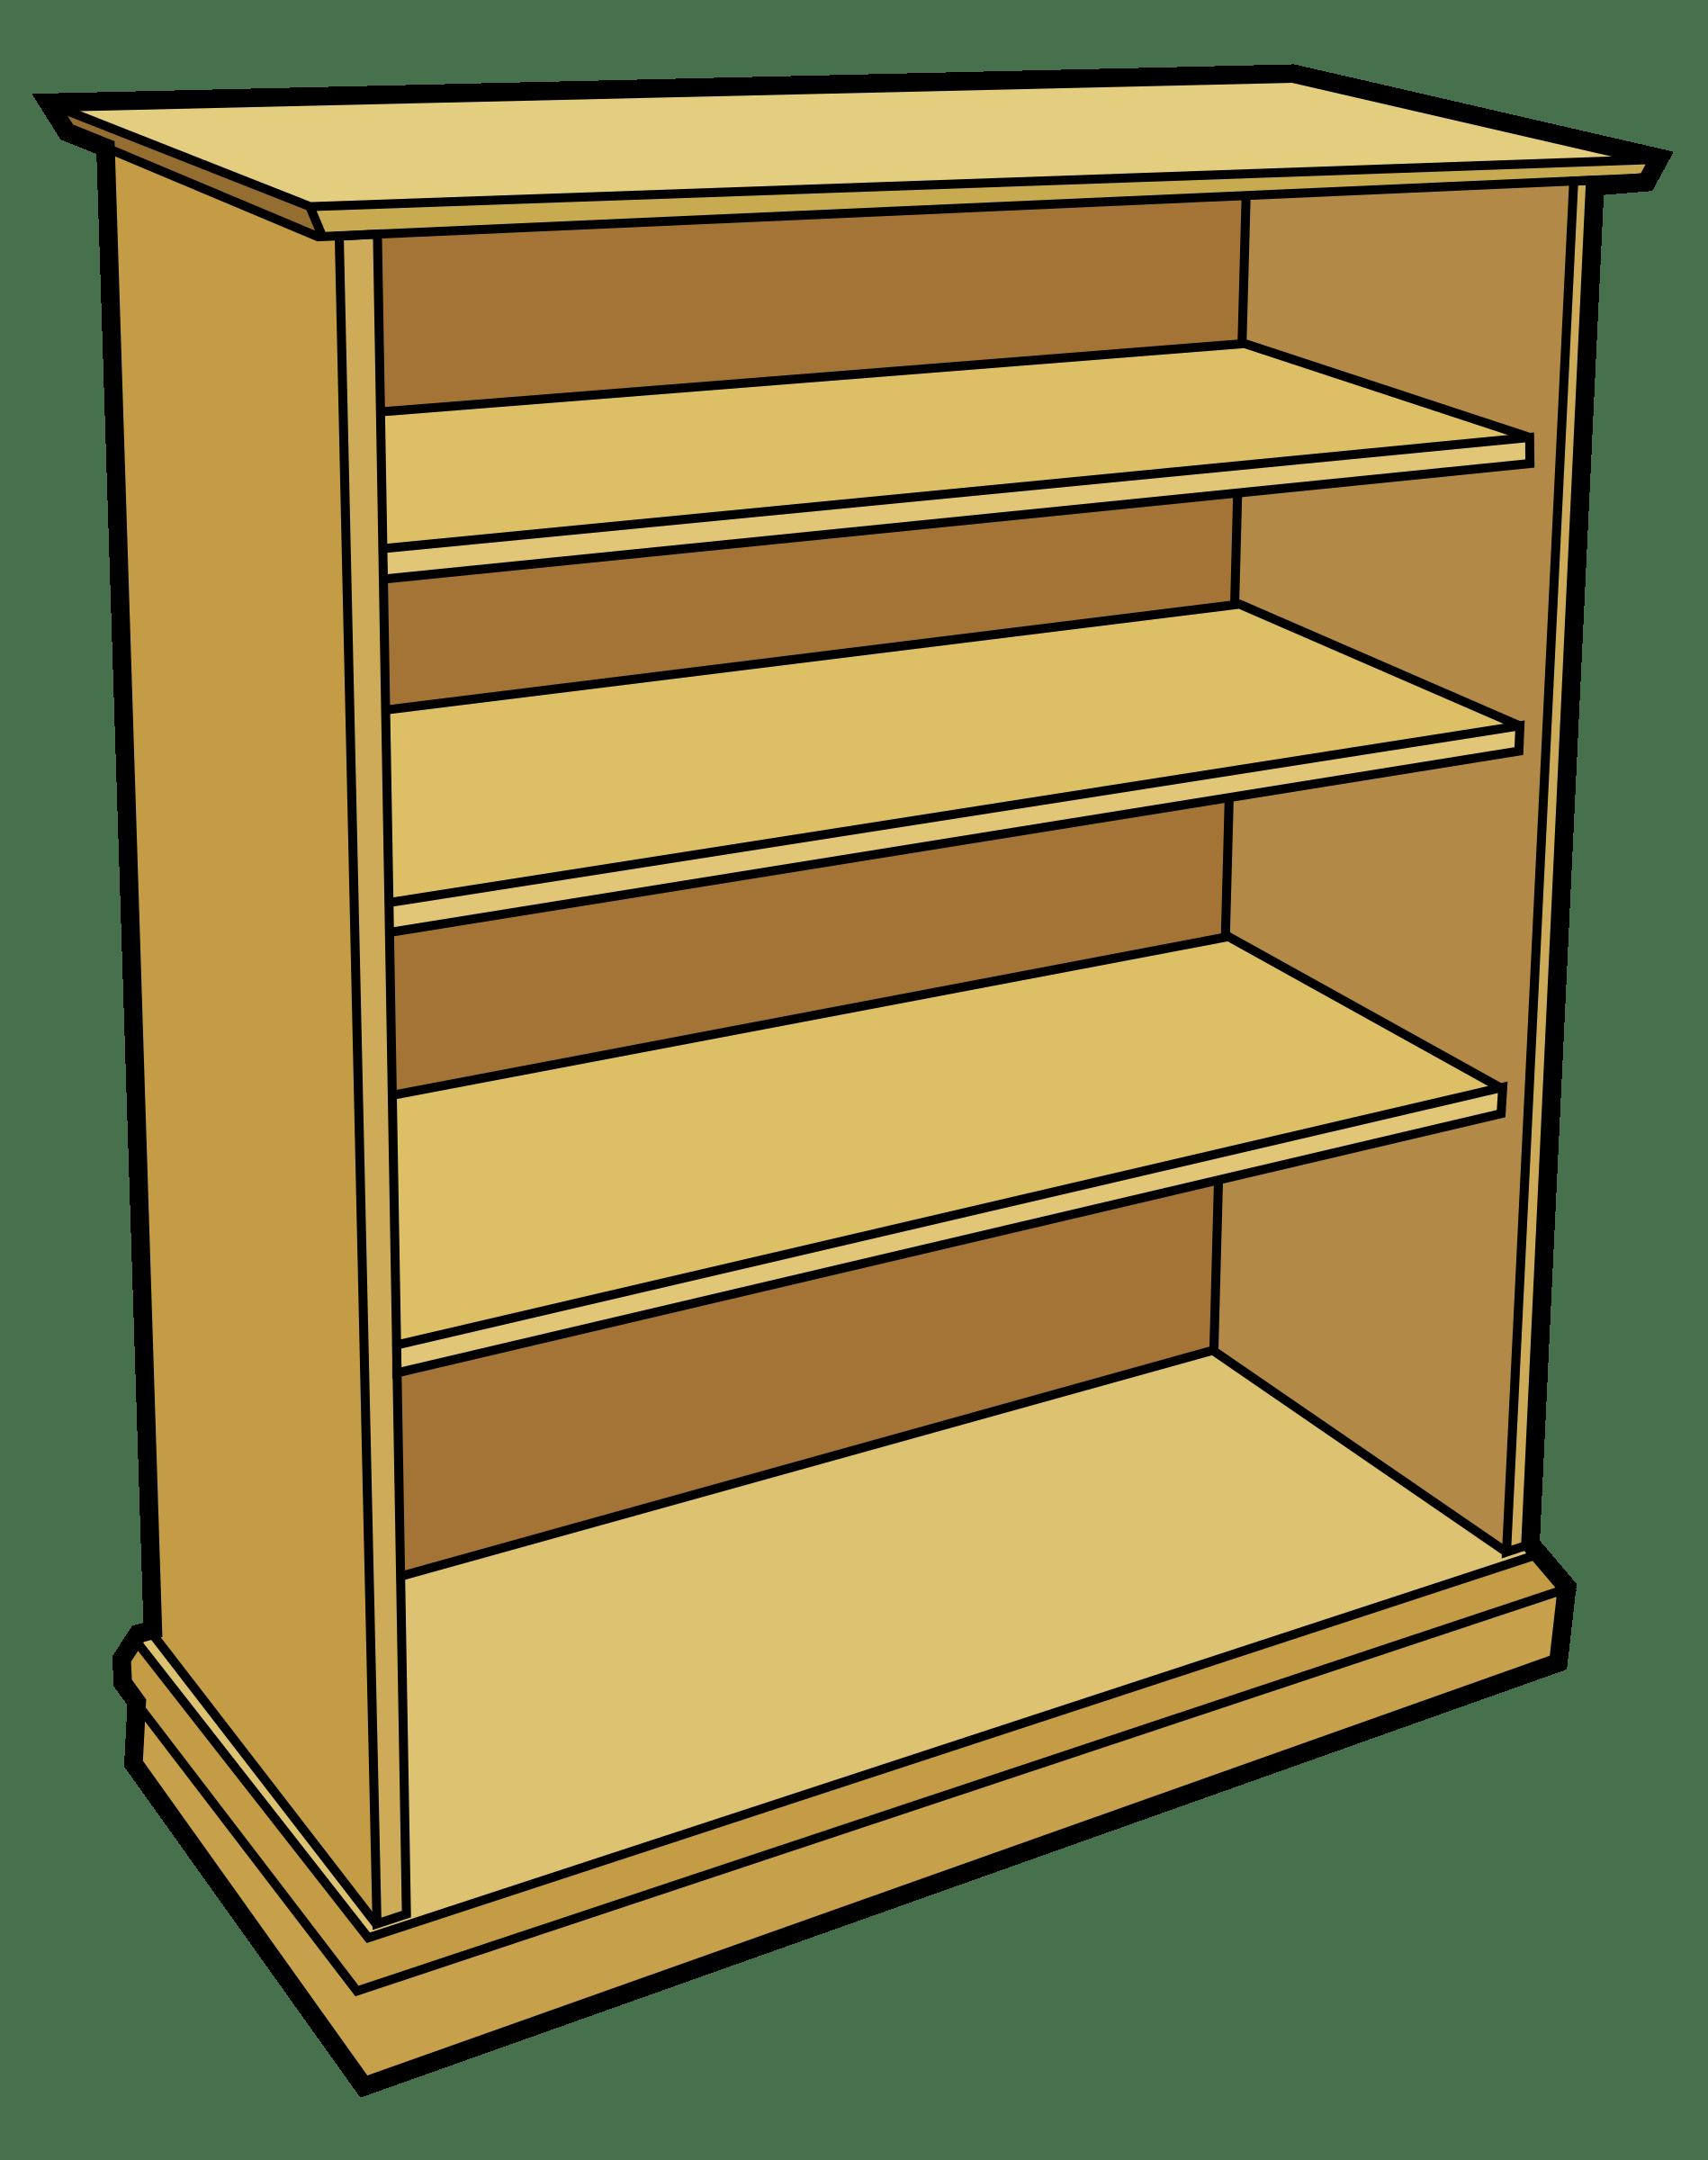 svg free Bookcase clipart wooden furniture. Bookshelf vector cabinet